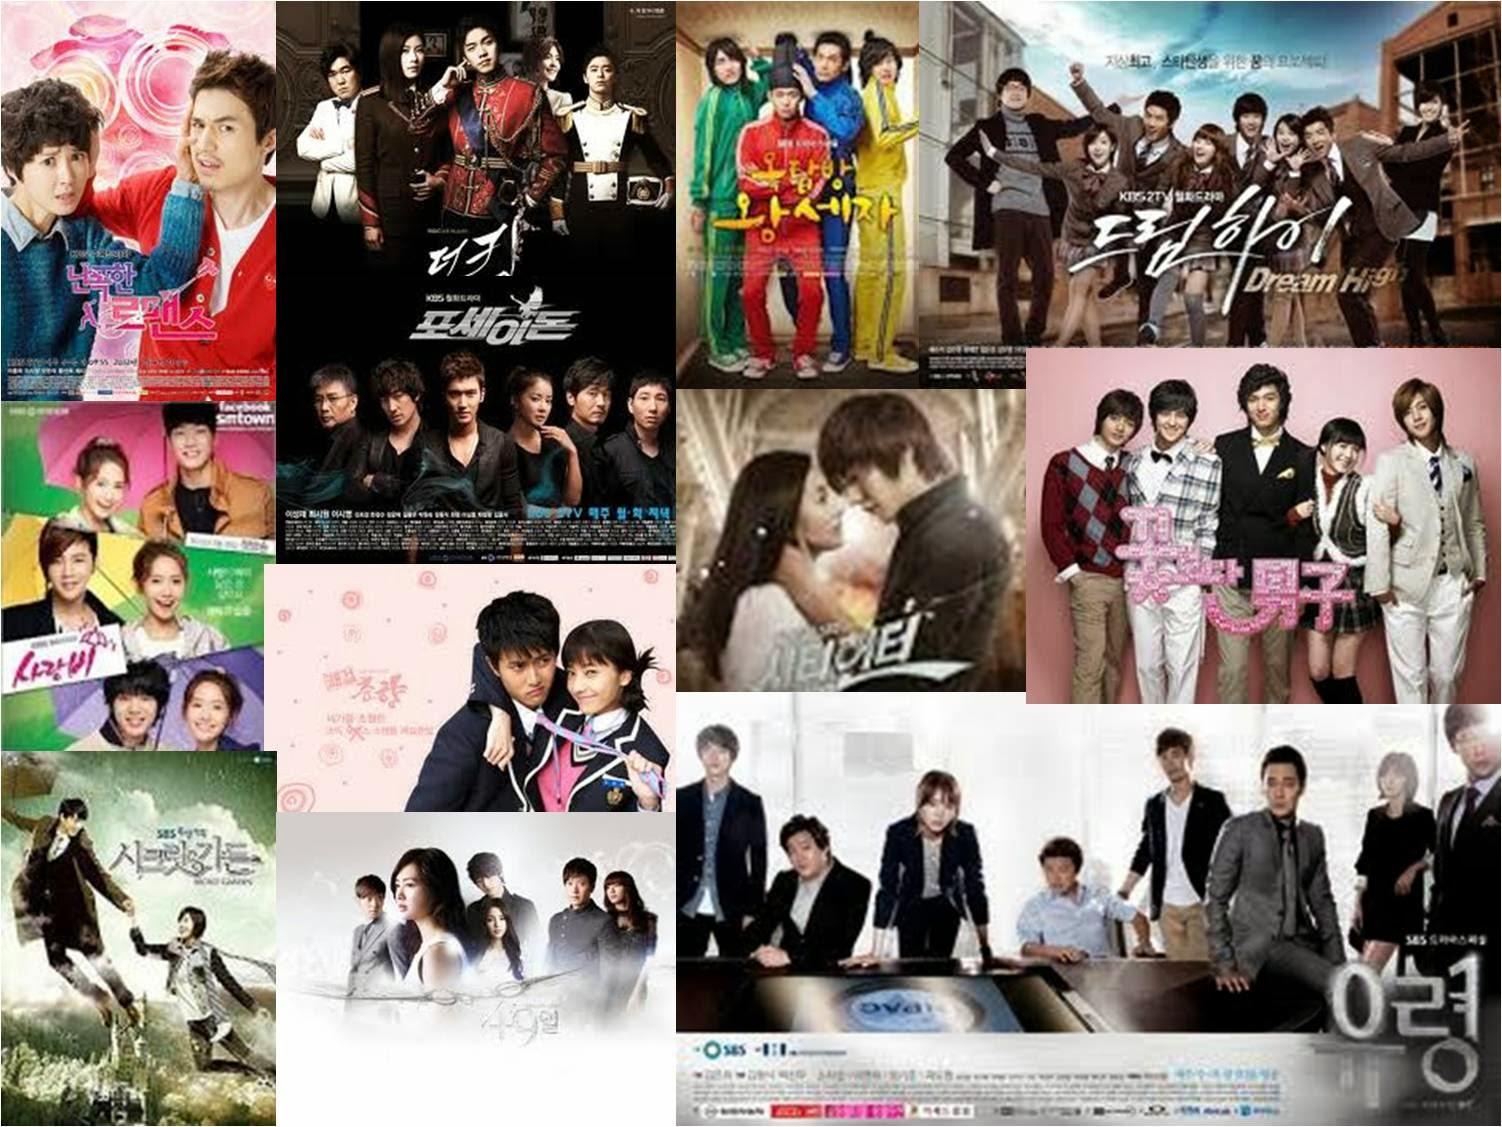 Kumpulan Quotes Drama Korea Ver 1 Let Share